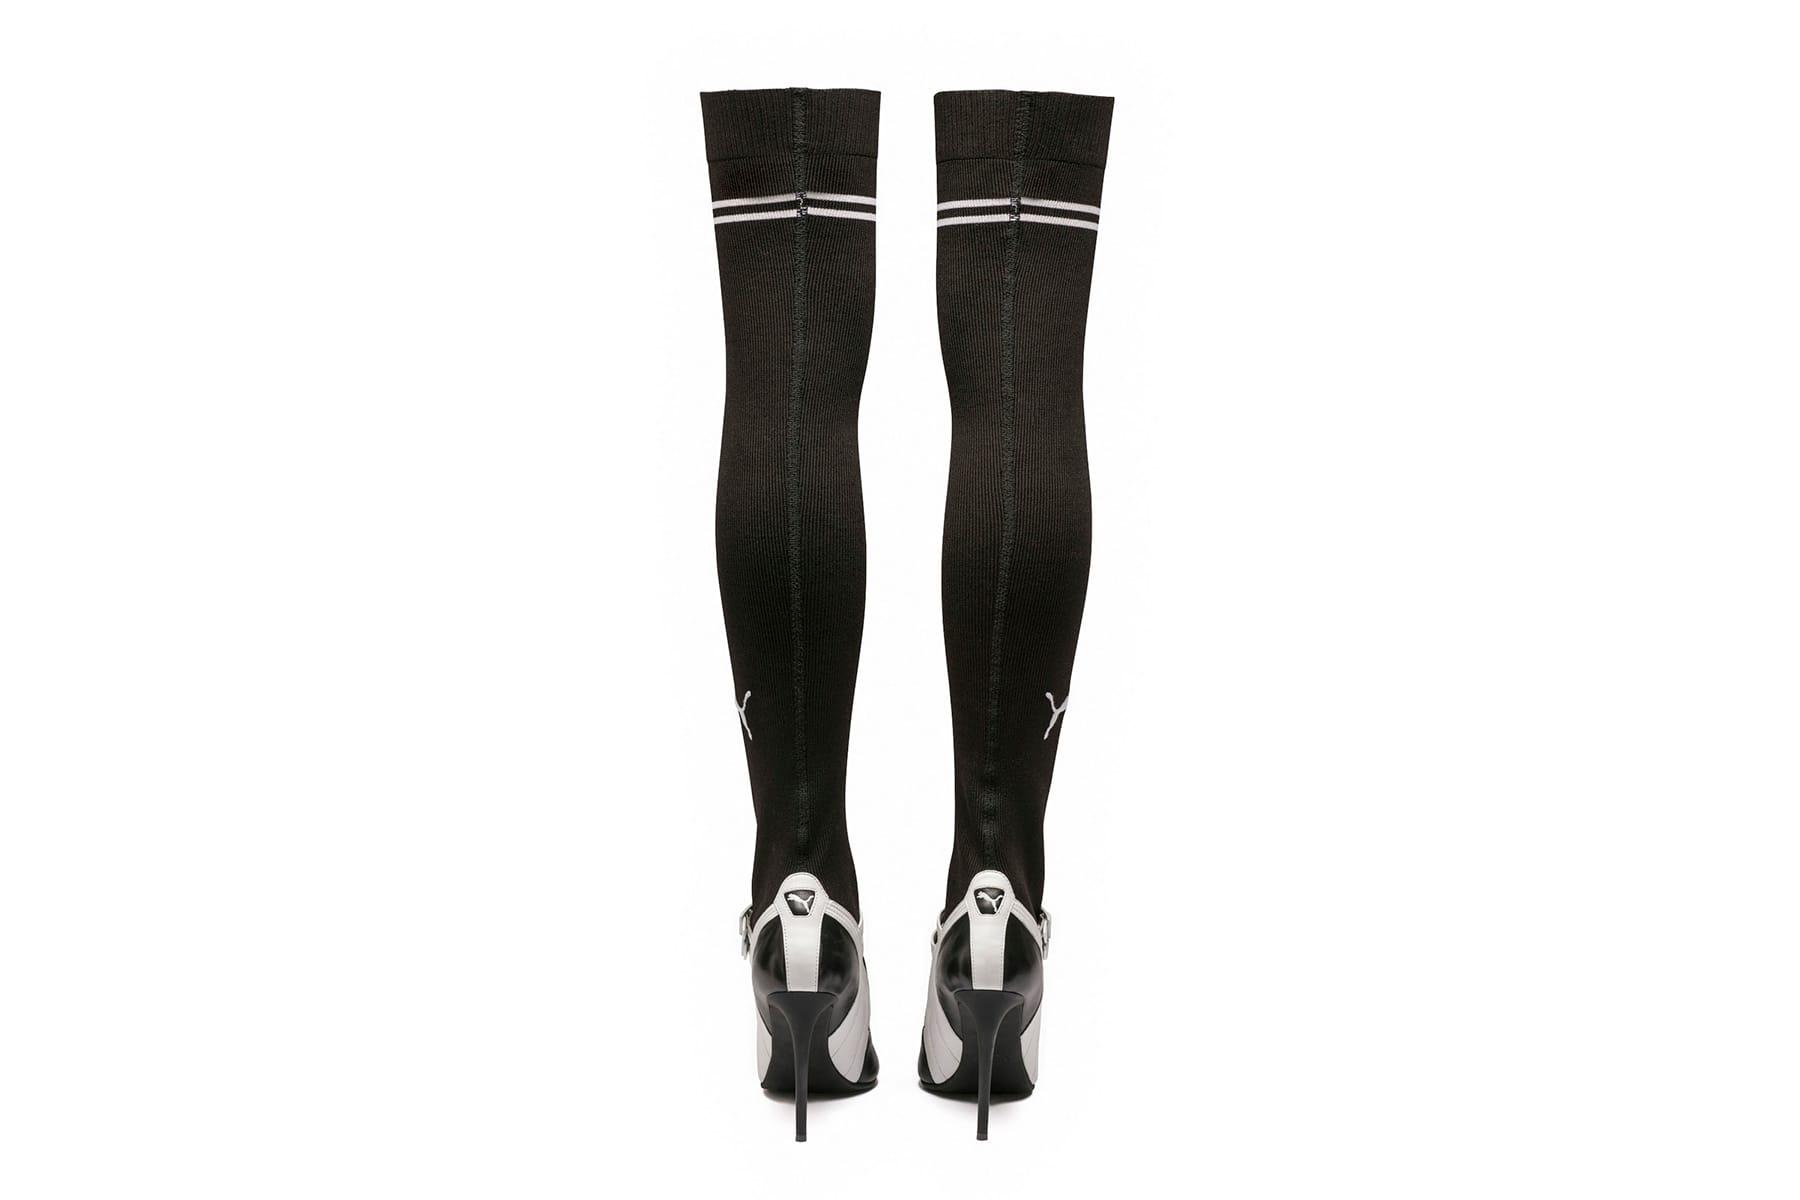 fenty knee high boots